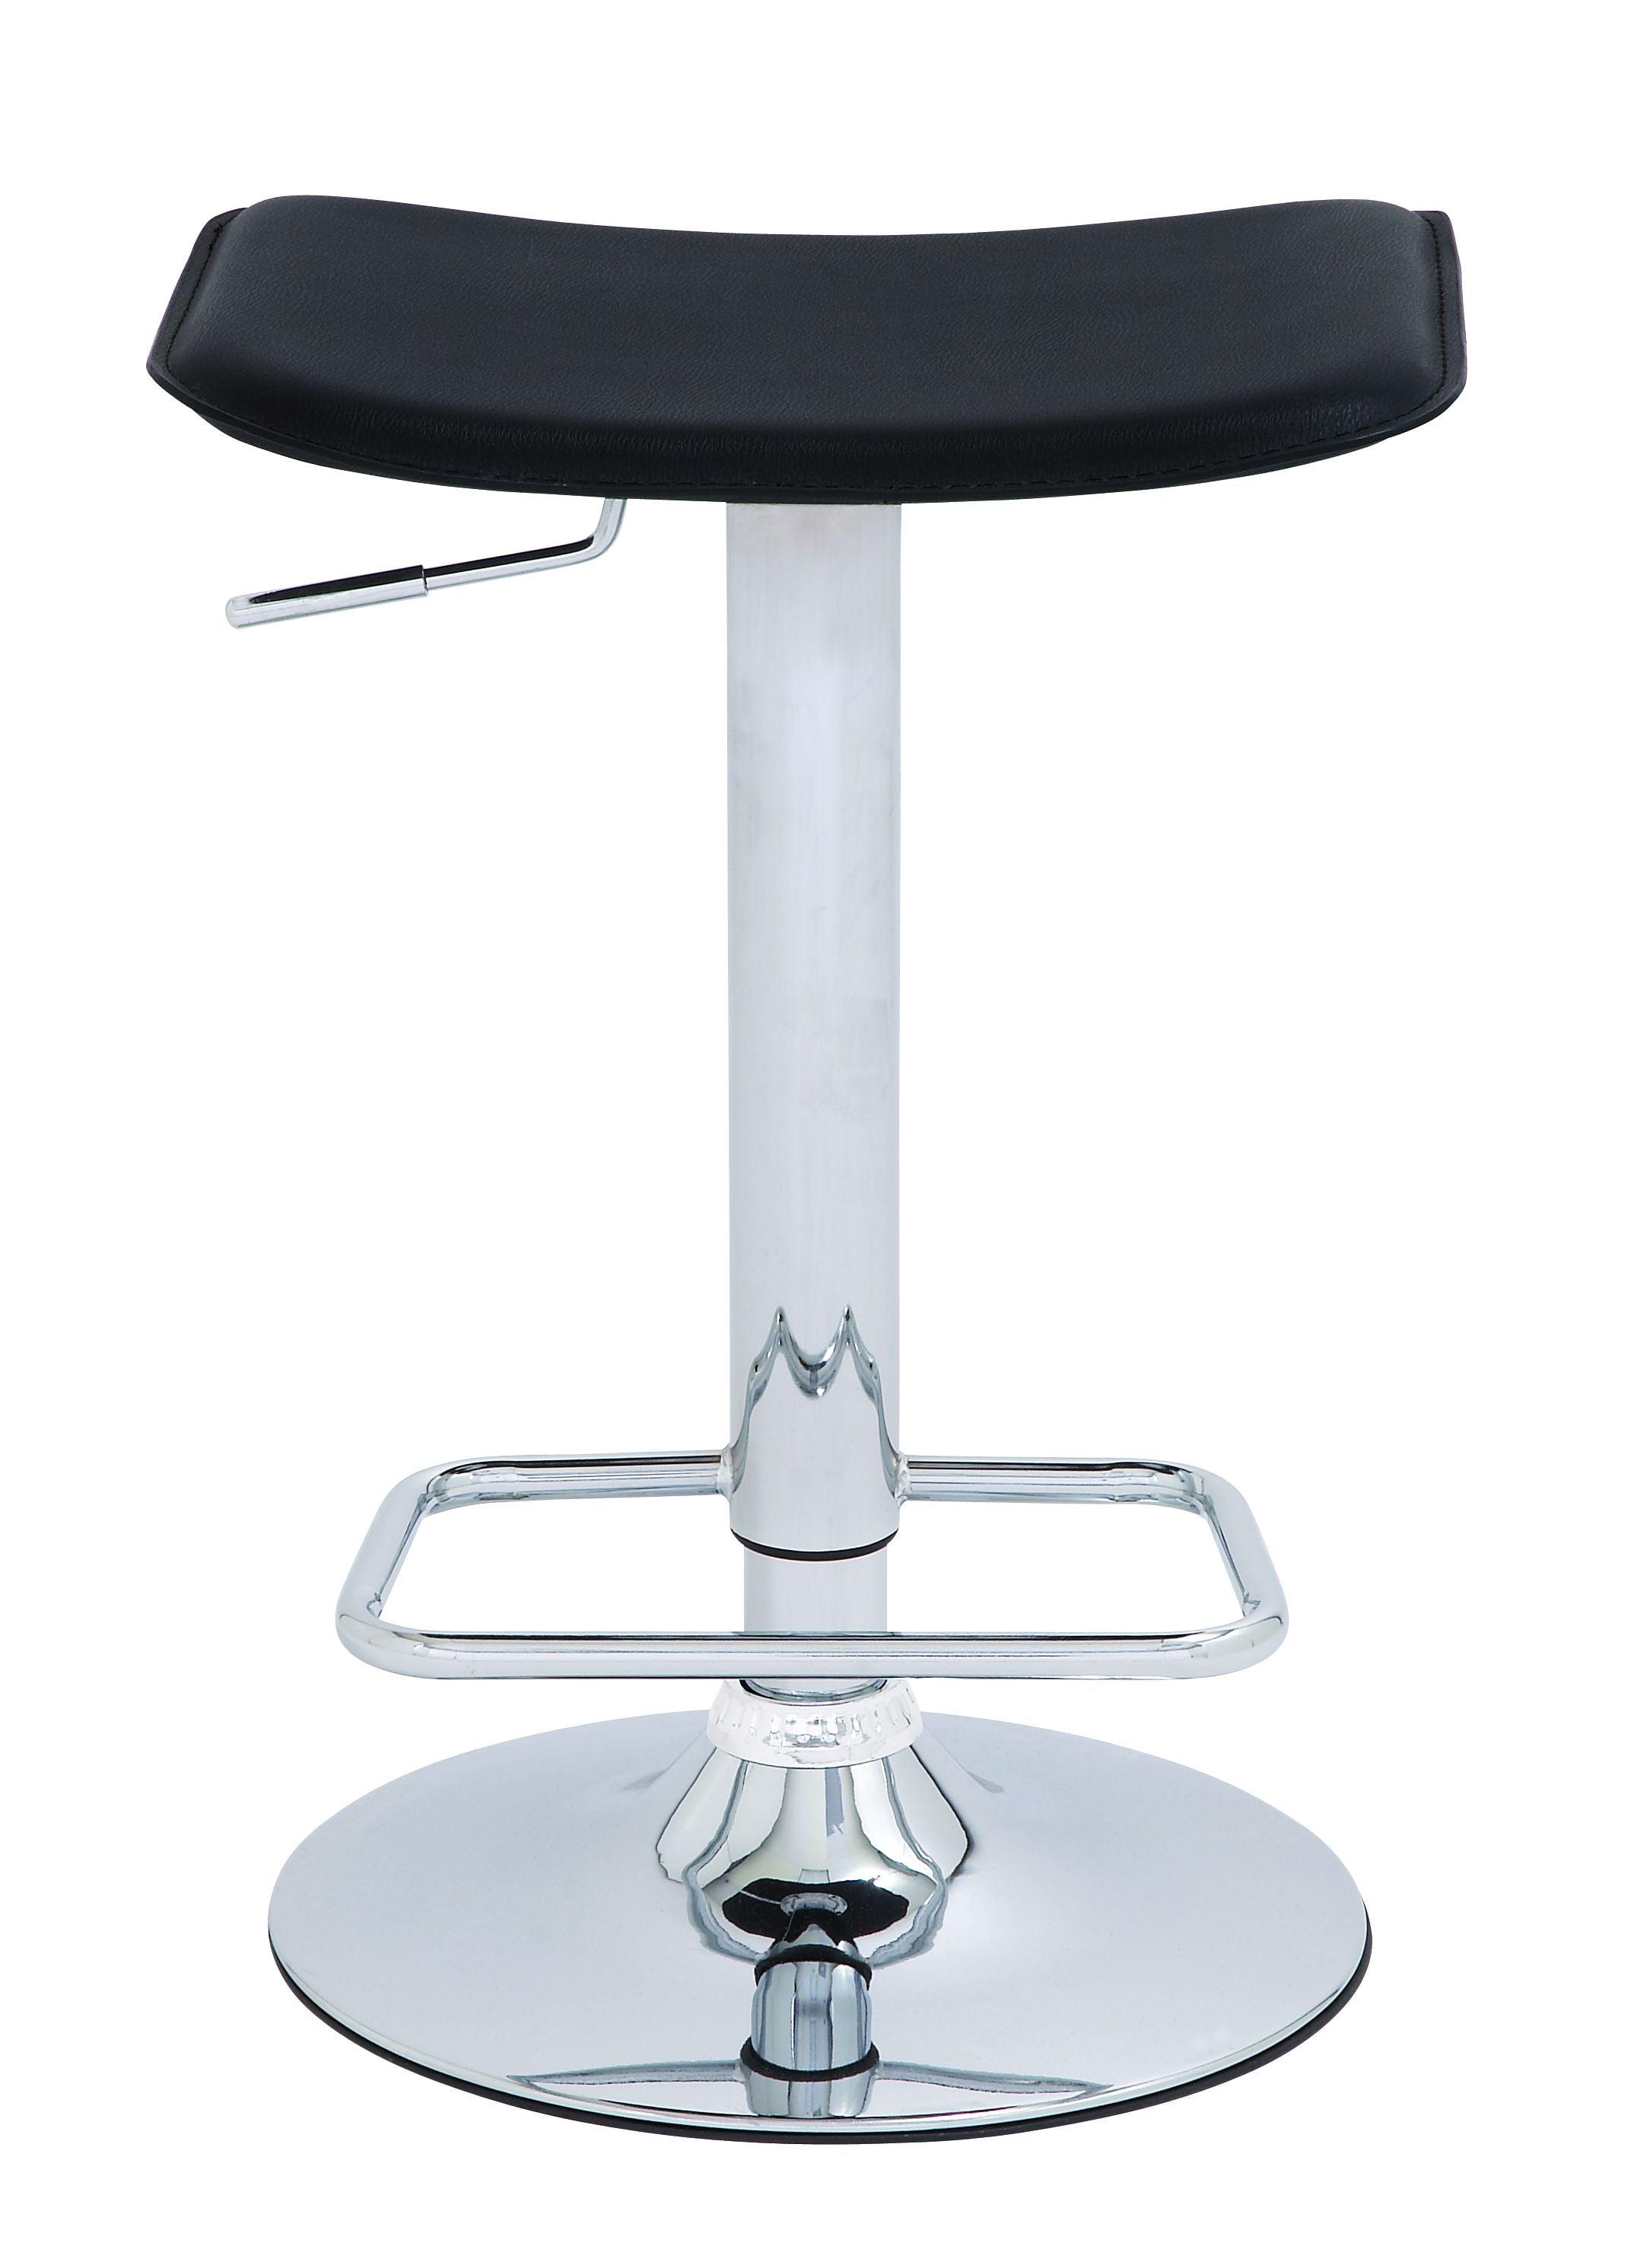 Modern Inspired Bar Stool Silver Chrome Black Seat Kitchen Decor 38950 Walmart Com